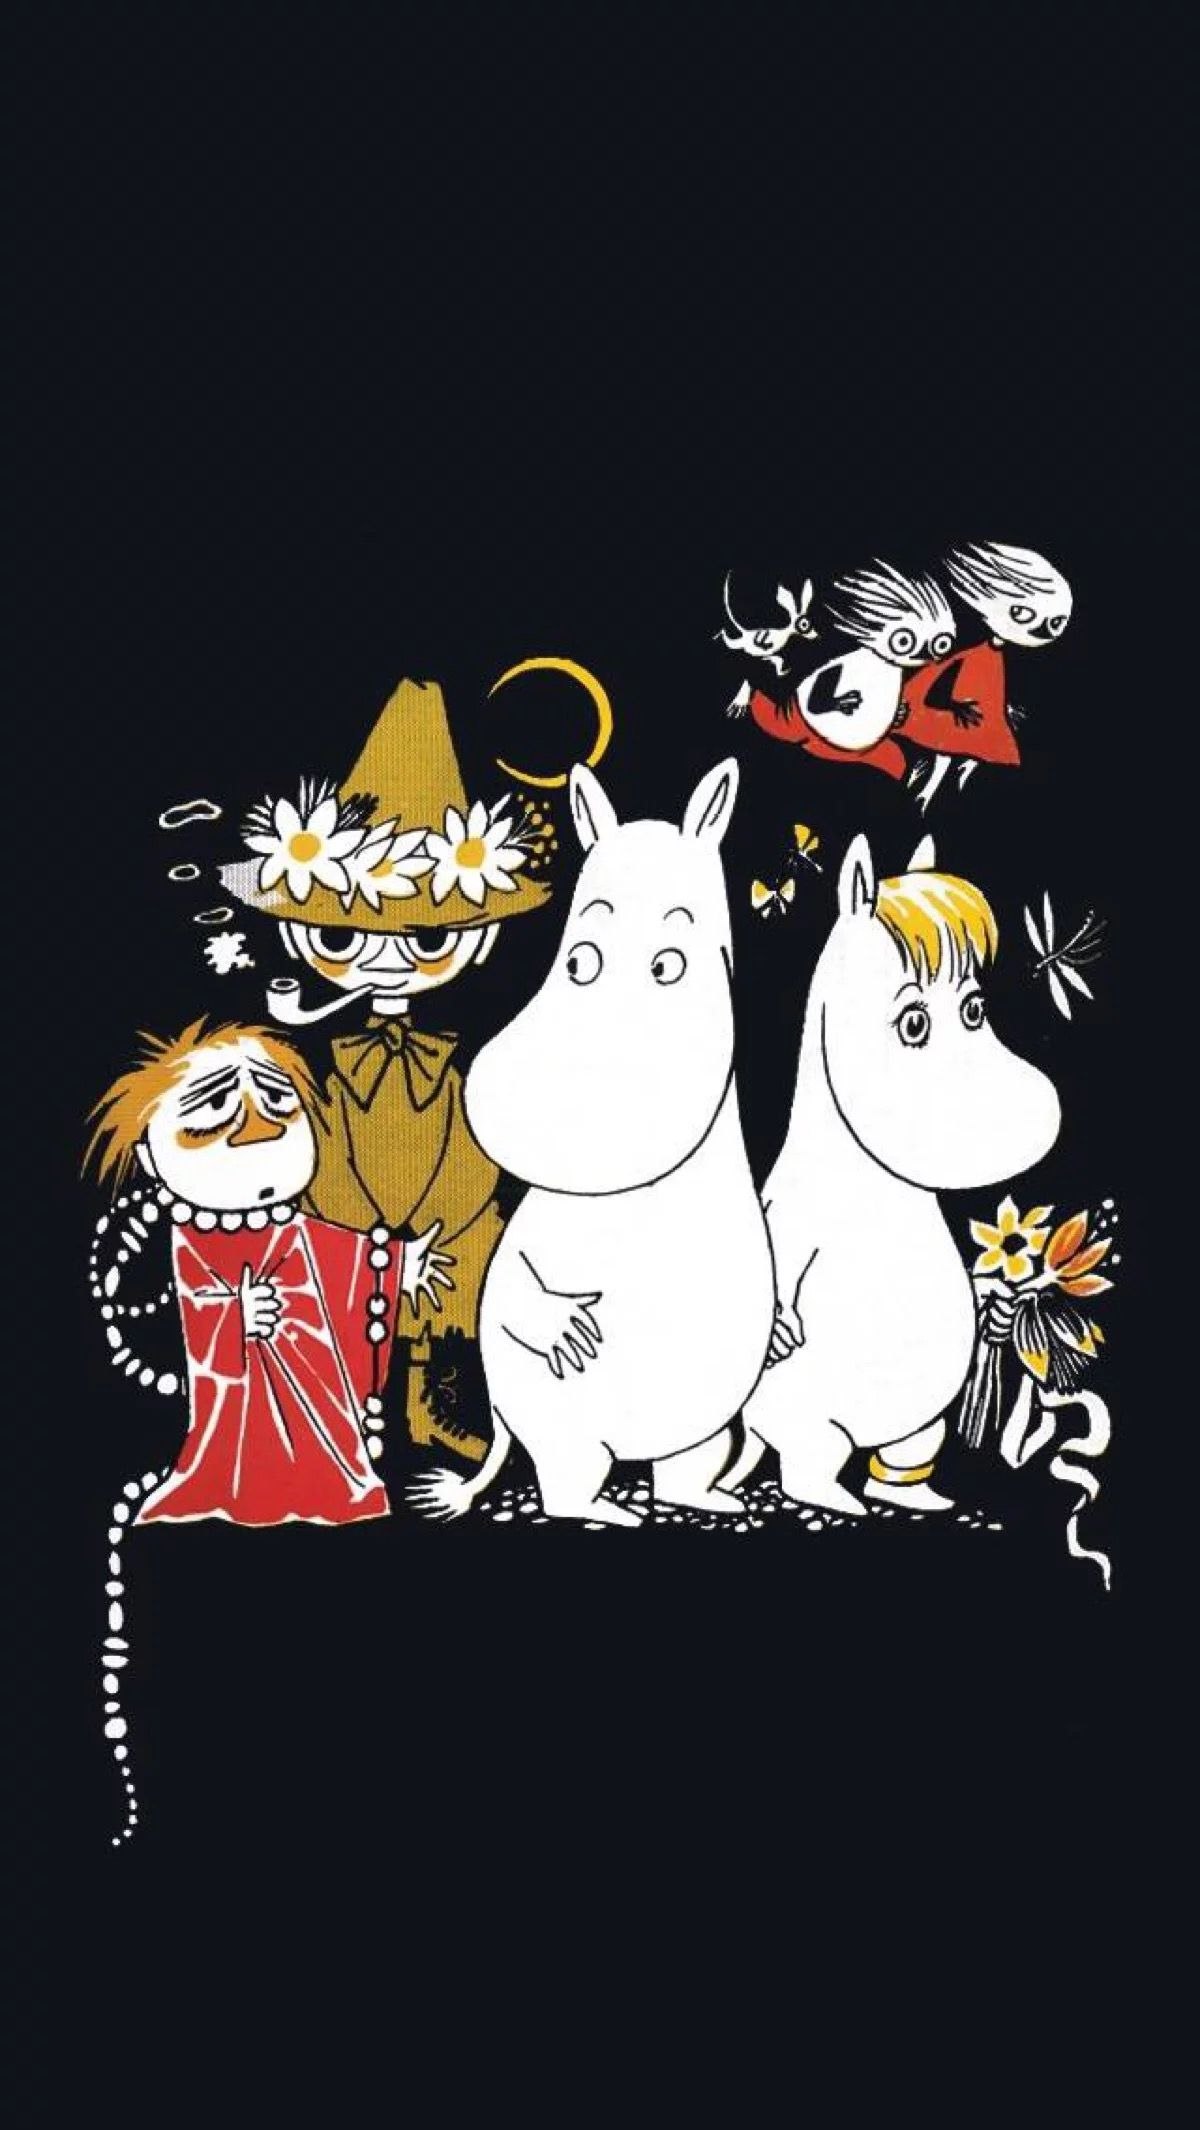 Moomin ムーミン 壁紙 ムーミン イラスト リトルミイ 画像